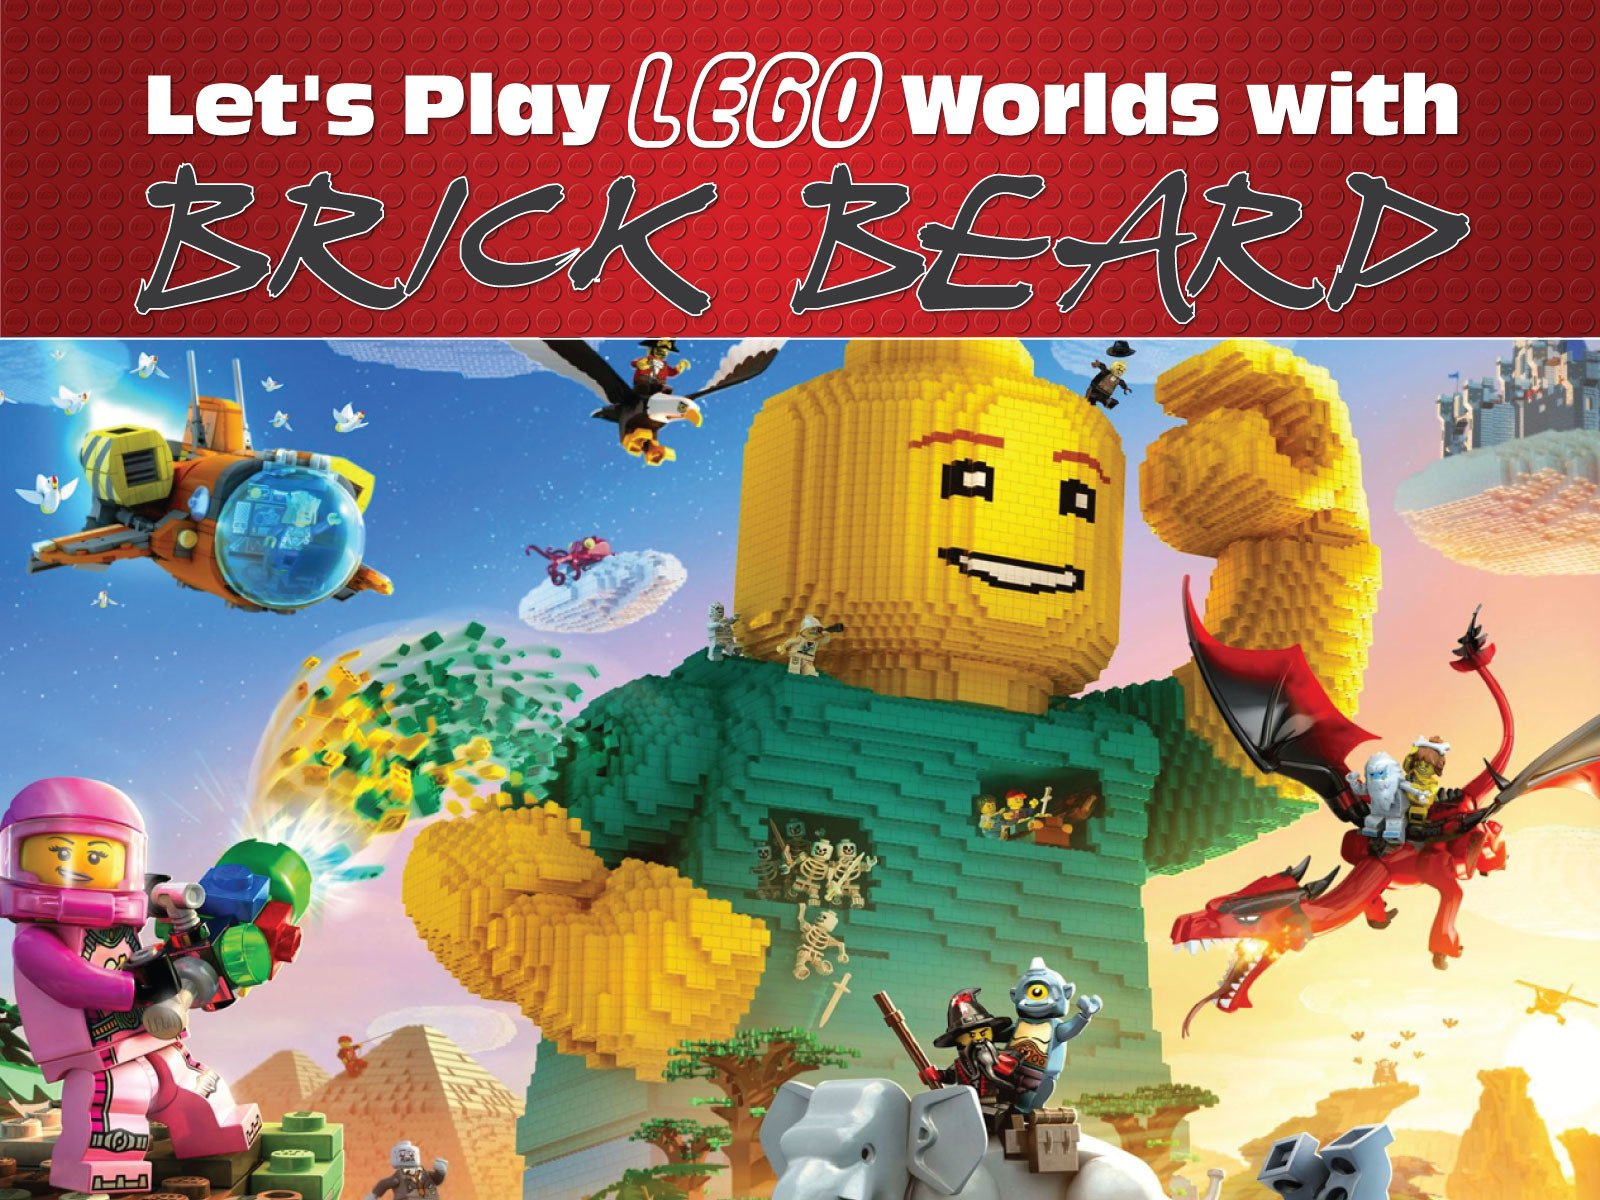 Clip: Let's Play Lego Worlds with Brick Beard - Season 1